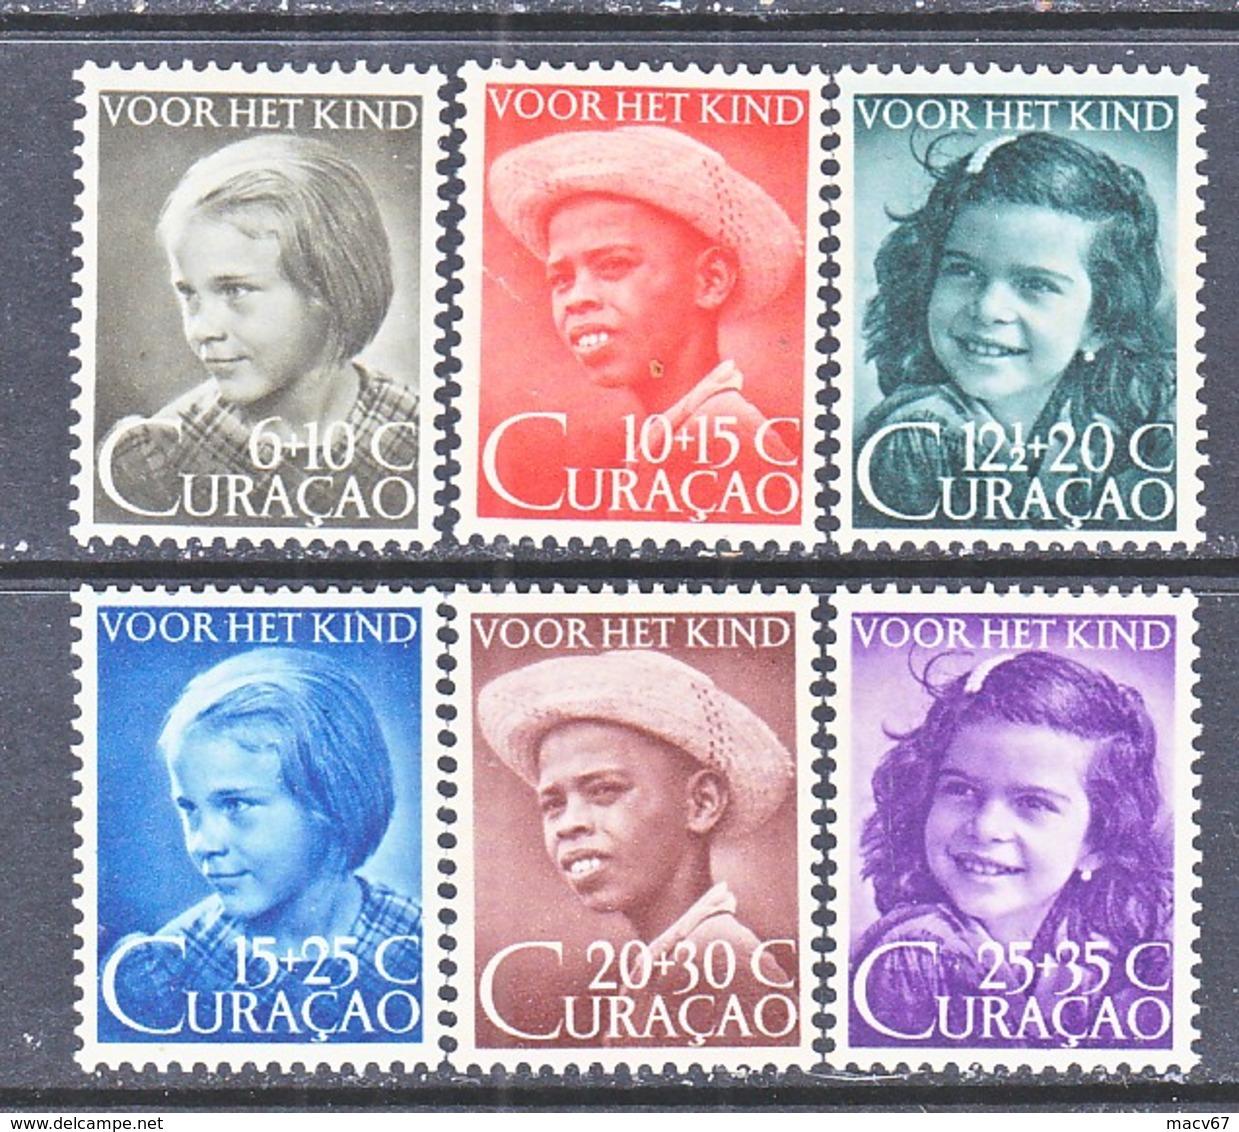 NETHERLANDS  CURACAO  B 4-9  ** - Curacao, Netherlands Antilles, Aruba